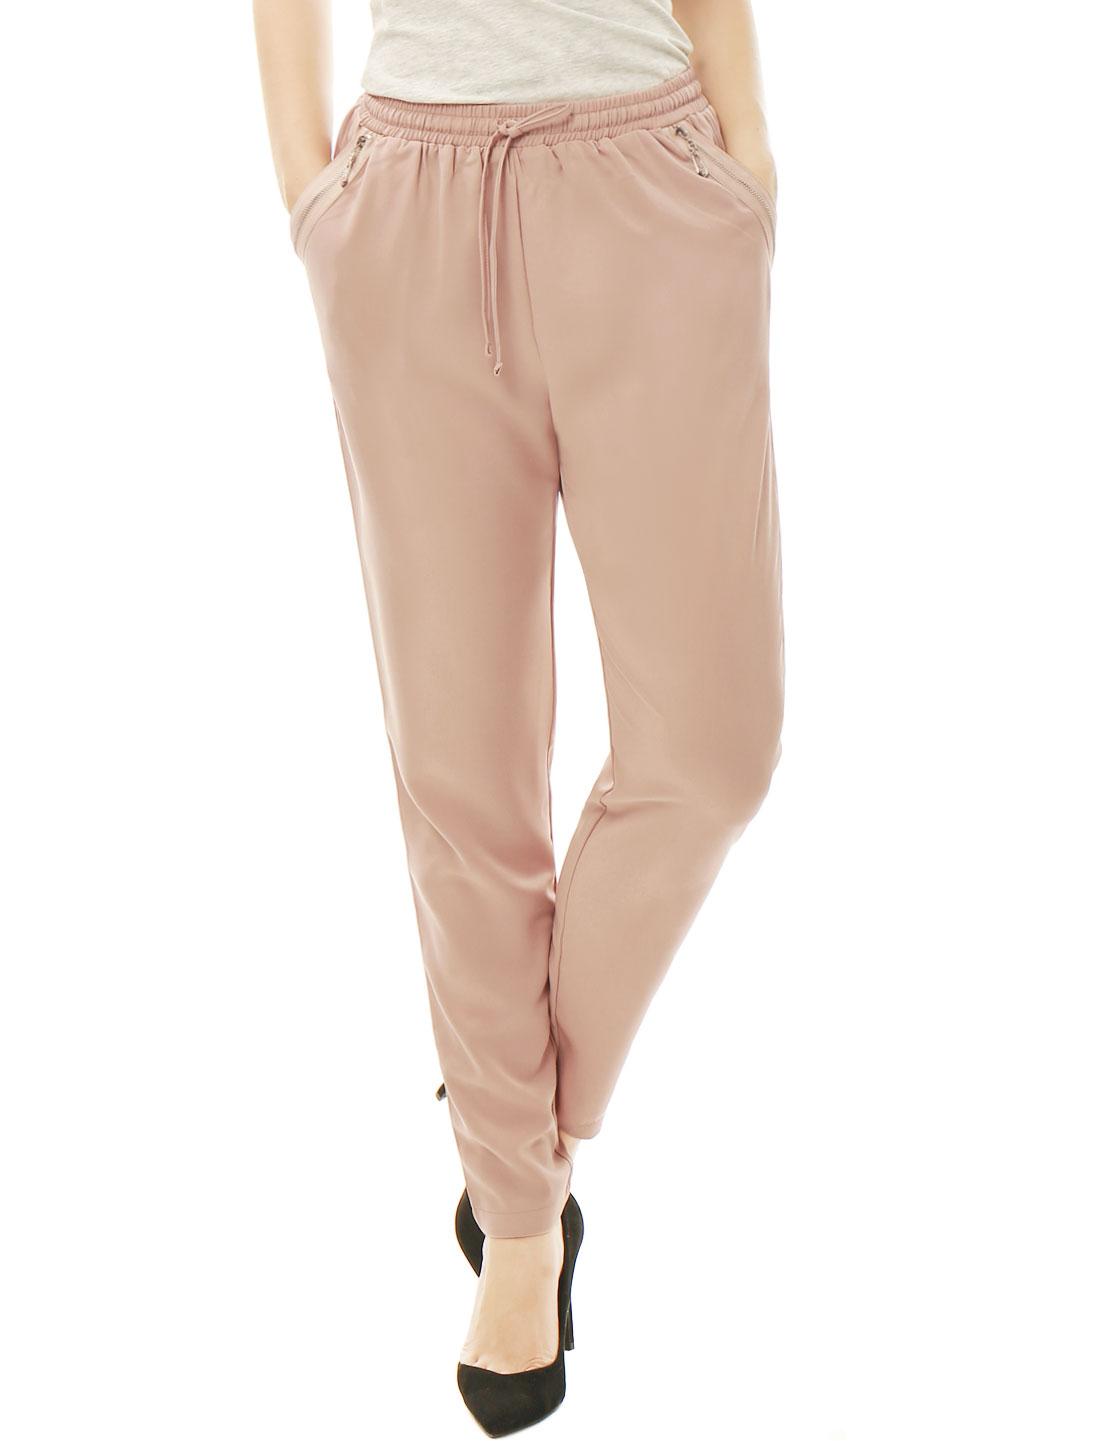 Women Drawstring Elastic Waist Slant Pockets Pants Pink L